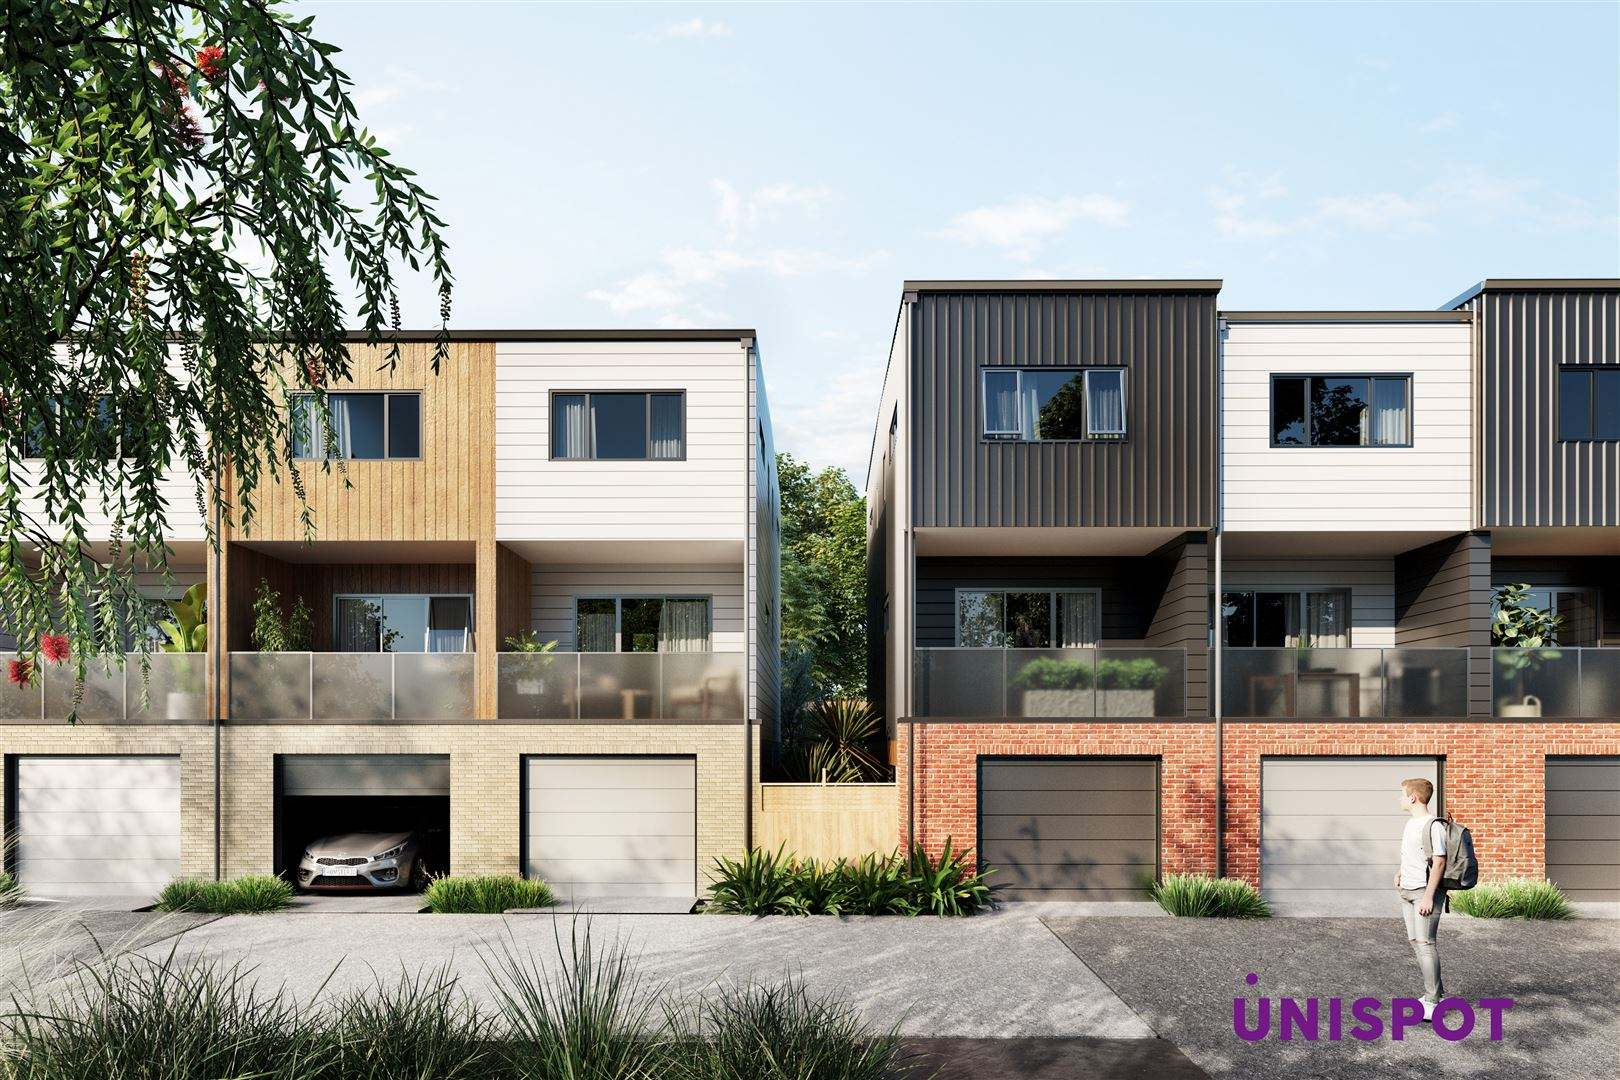 Albany 3房 全新精品住宅 专为现代生活打造 地理位置便利 公私好校云集 10年质保安心无忧 首付仅需10%! Brand New - Chic Urban Living